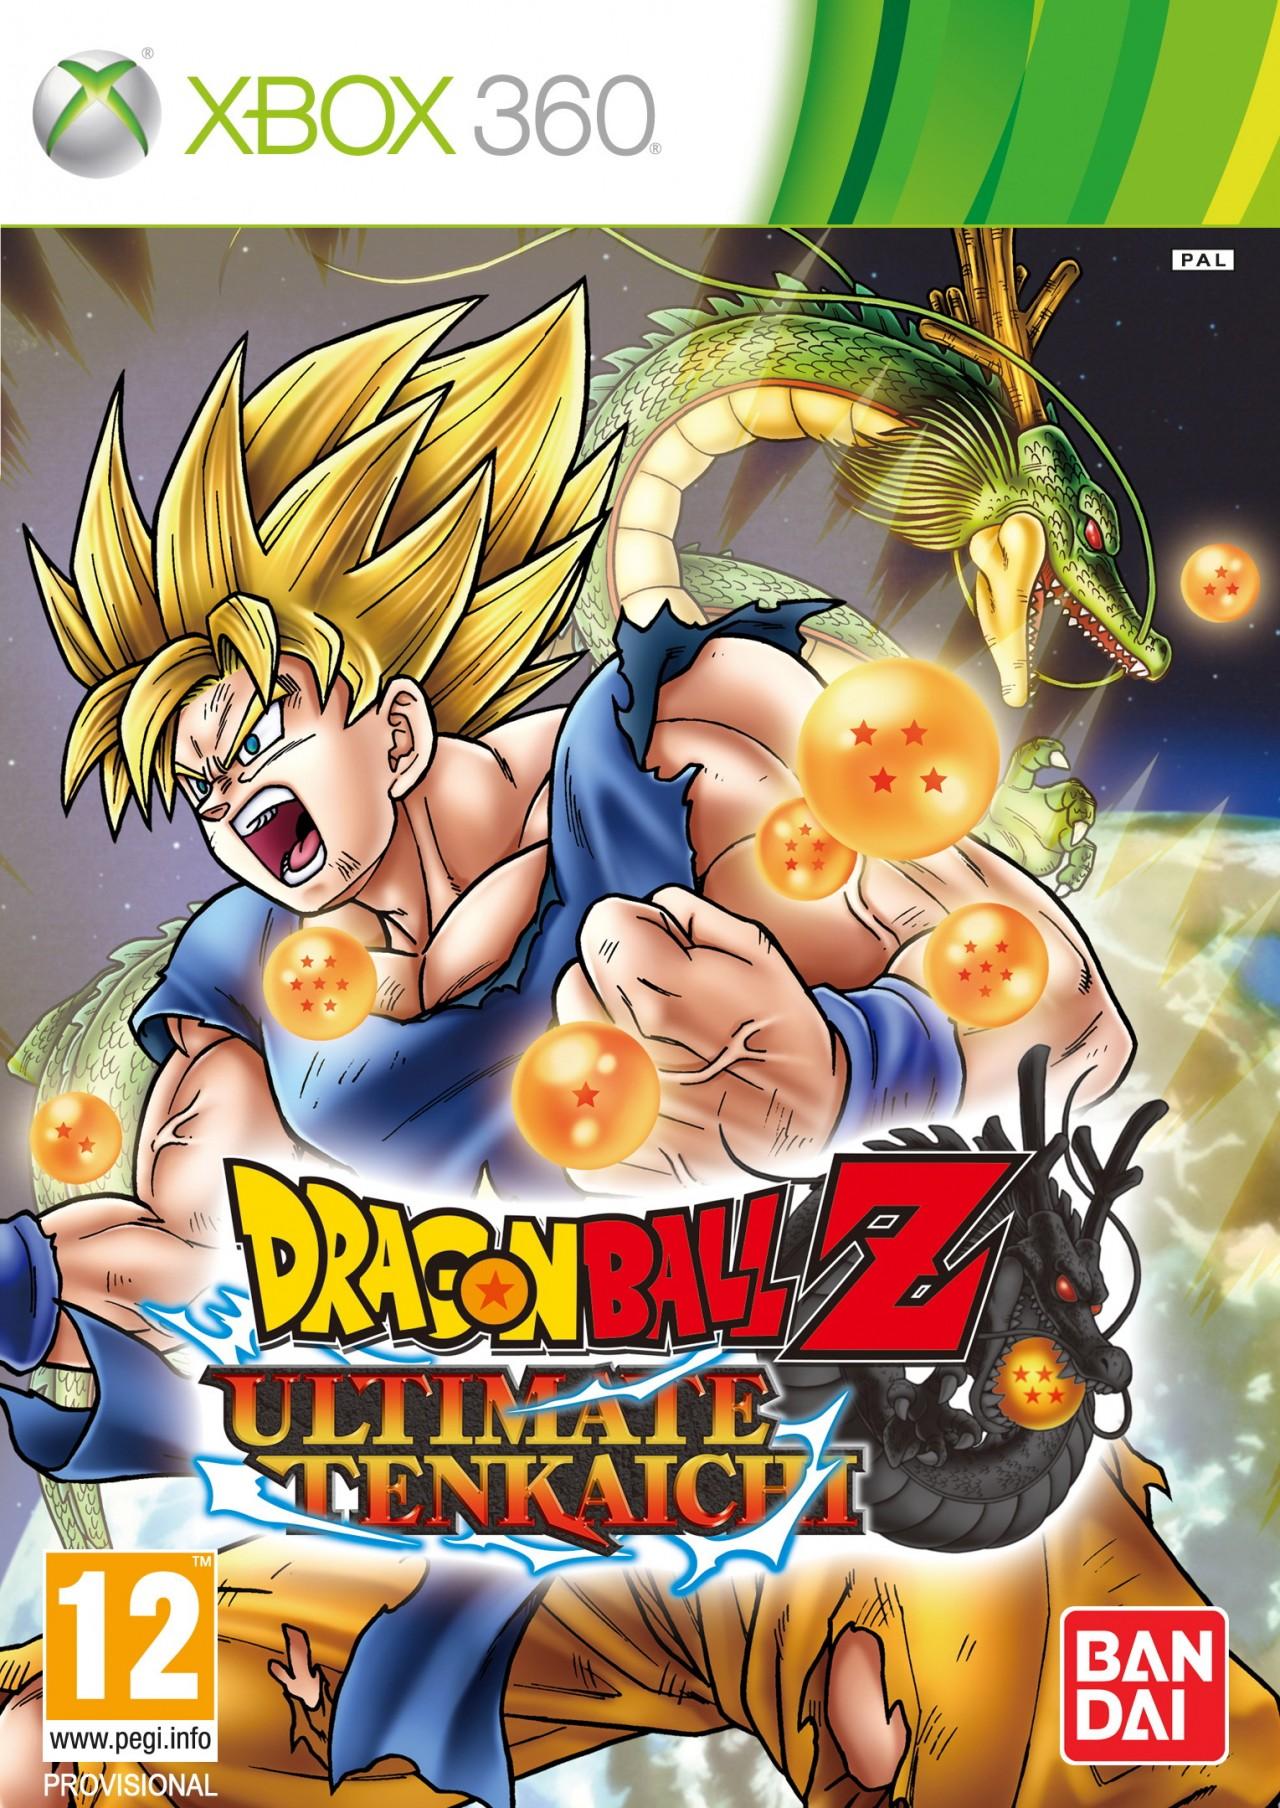 Dragon ball z ultimate tenkaichi - Xboxygen le site consacre aux consoles xbox et xbox ...